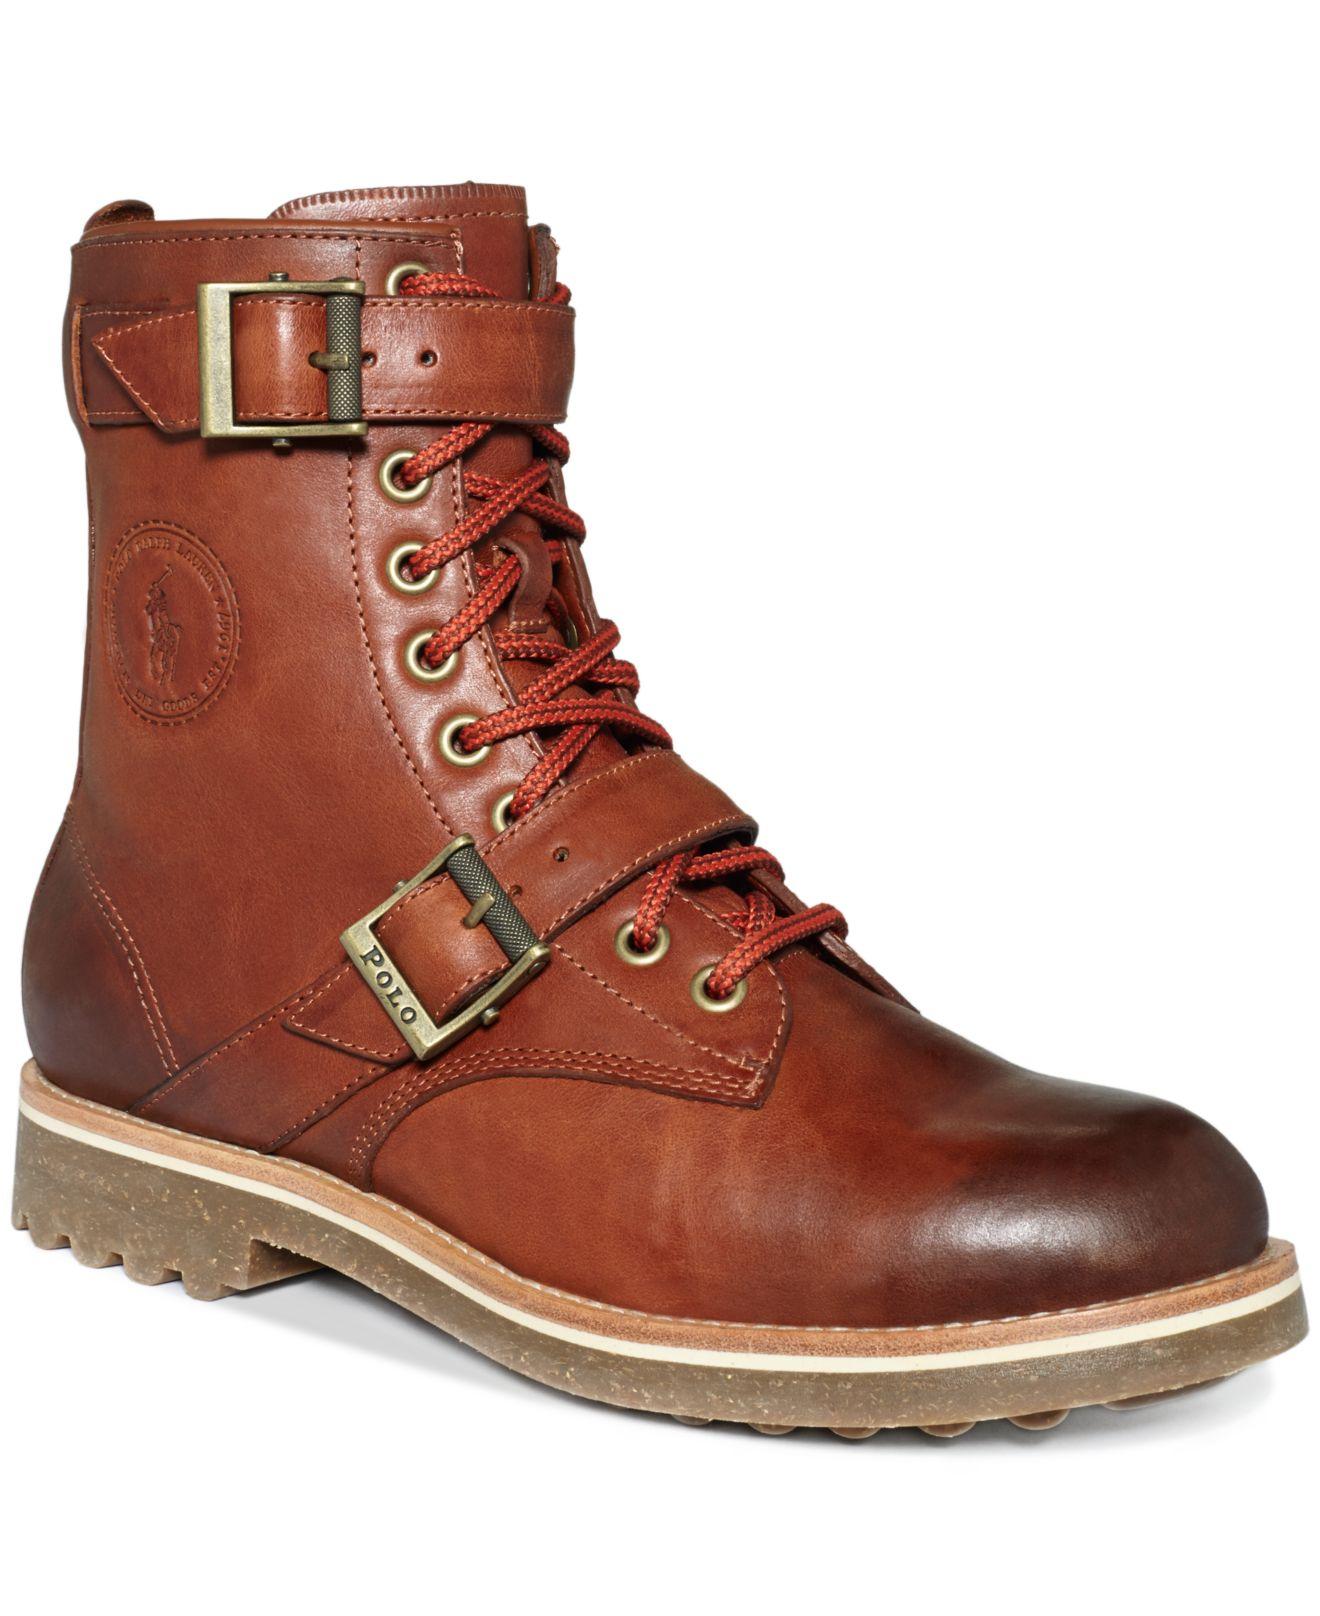 Ralph Lauren Shoes Australia